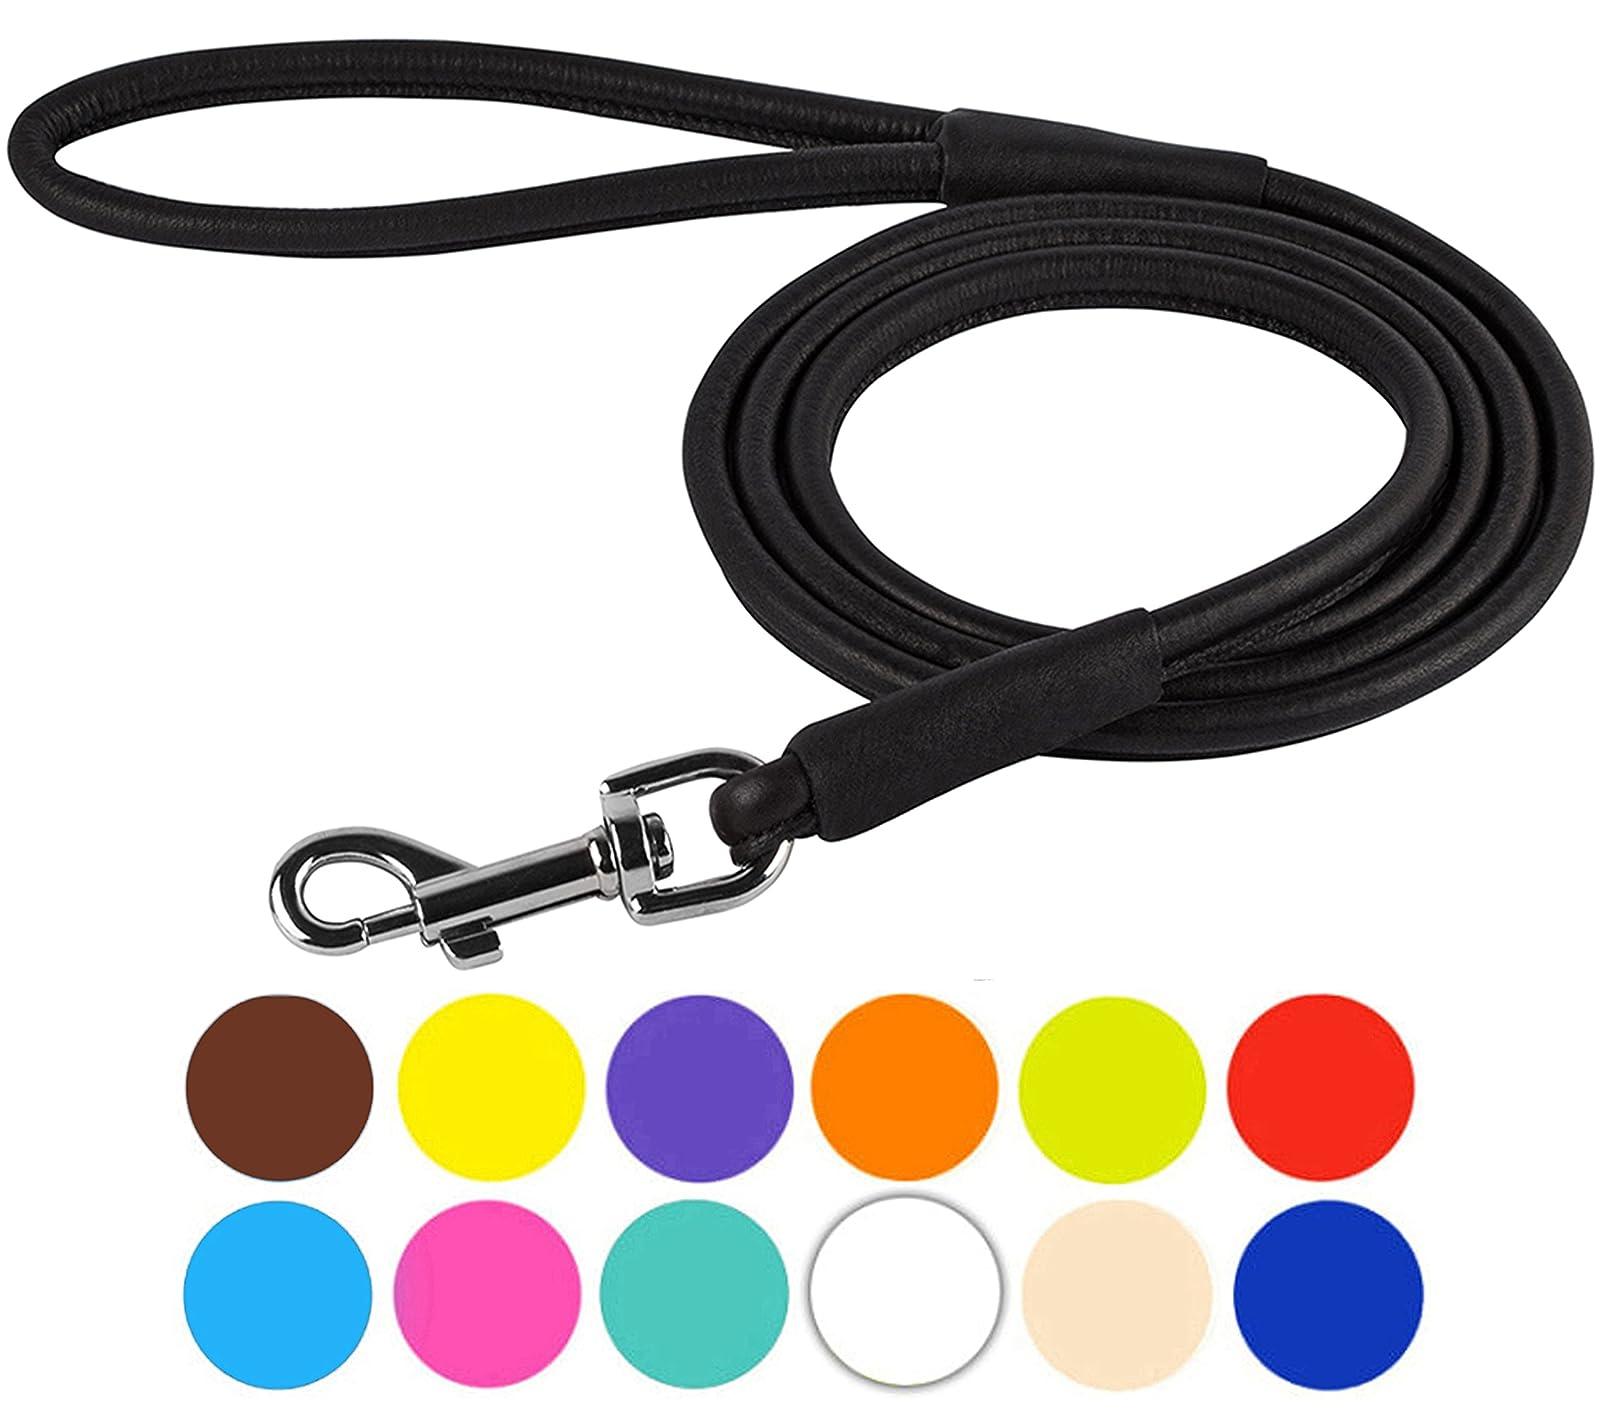 CollarDirect Rolled Leather Dog Leash 4ft Soft - 10